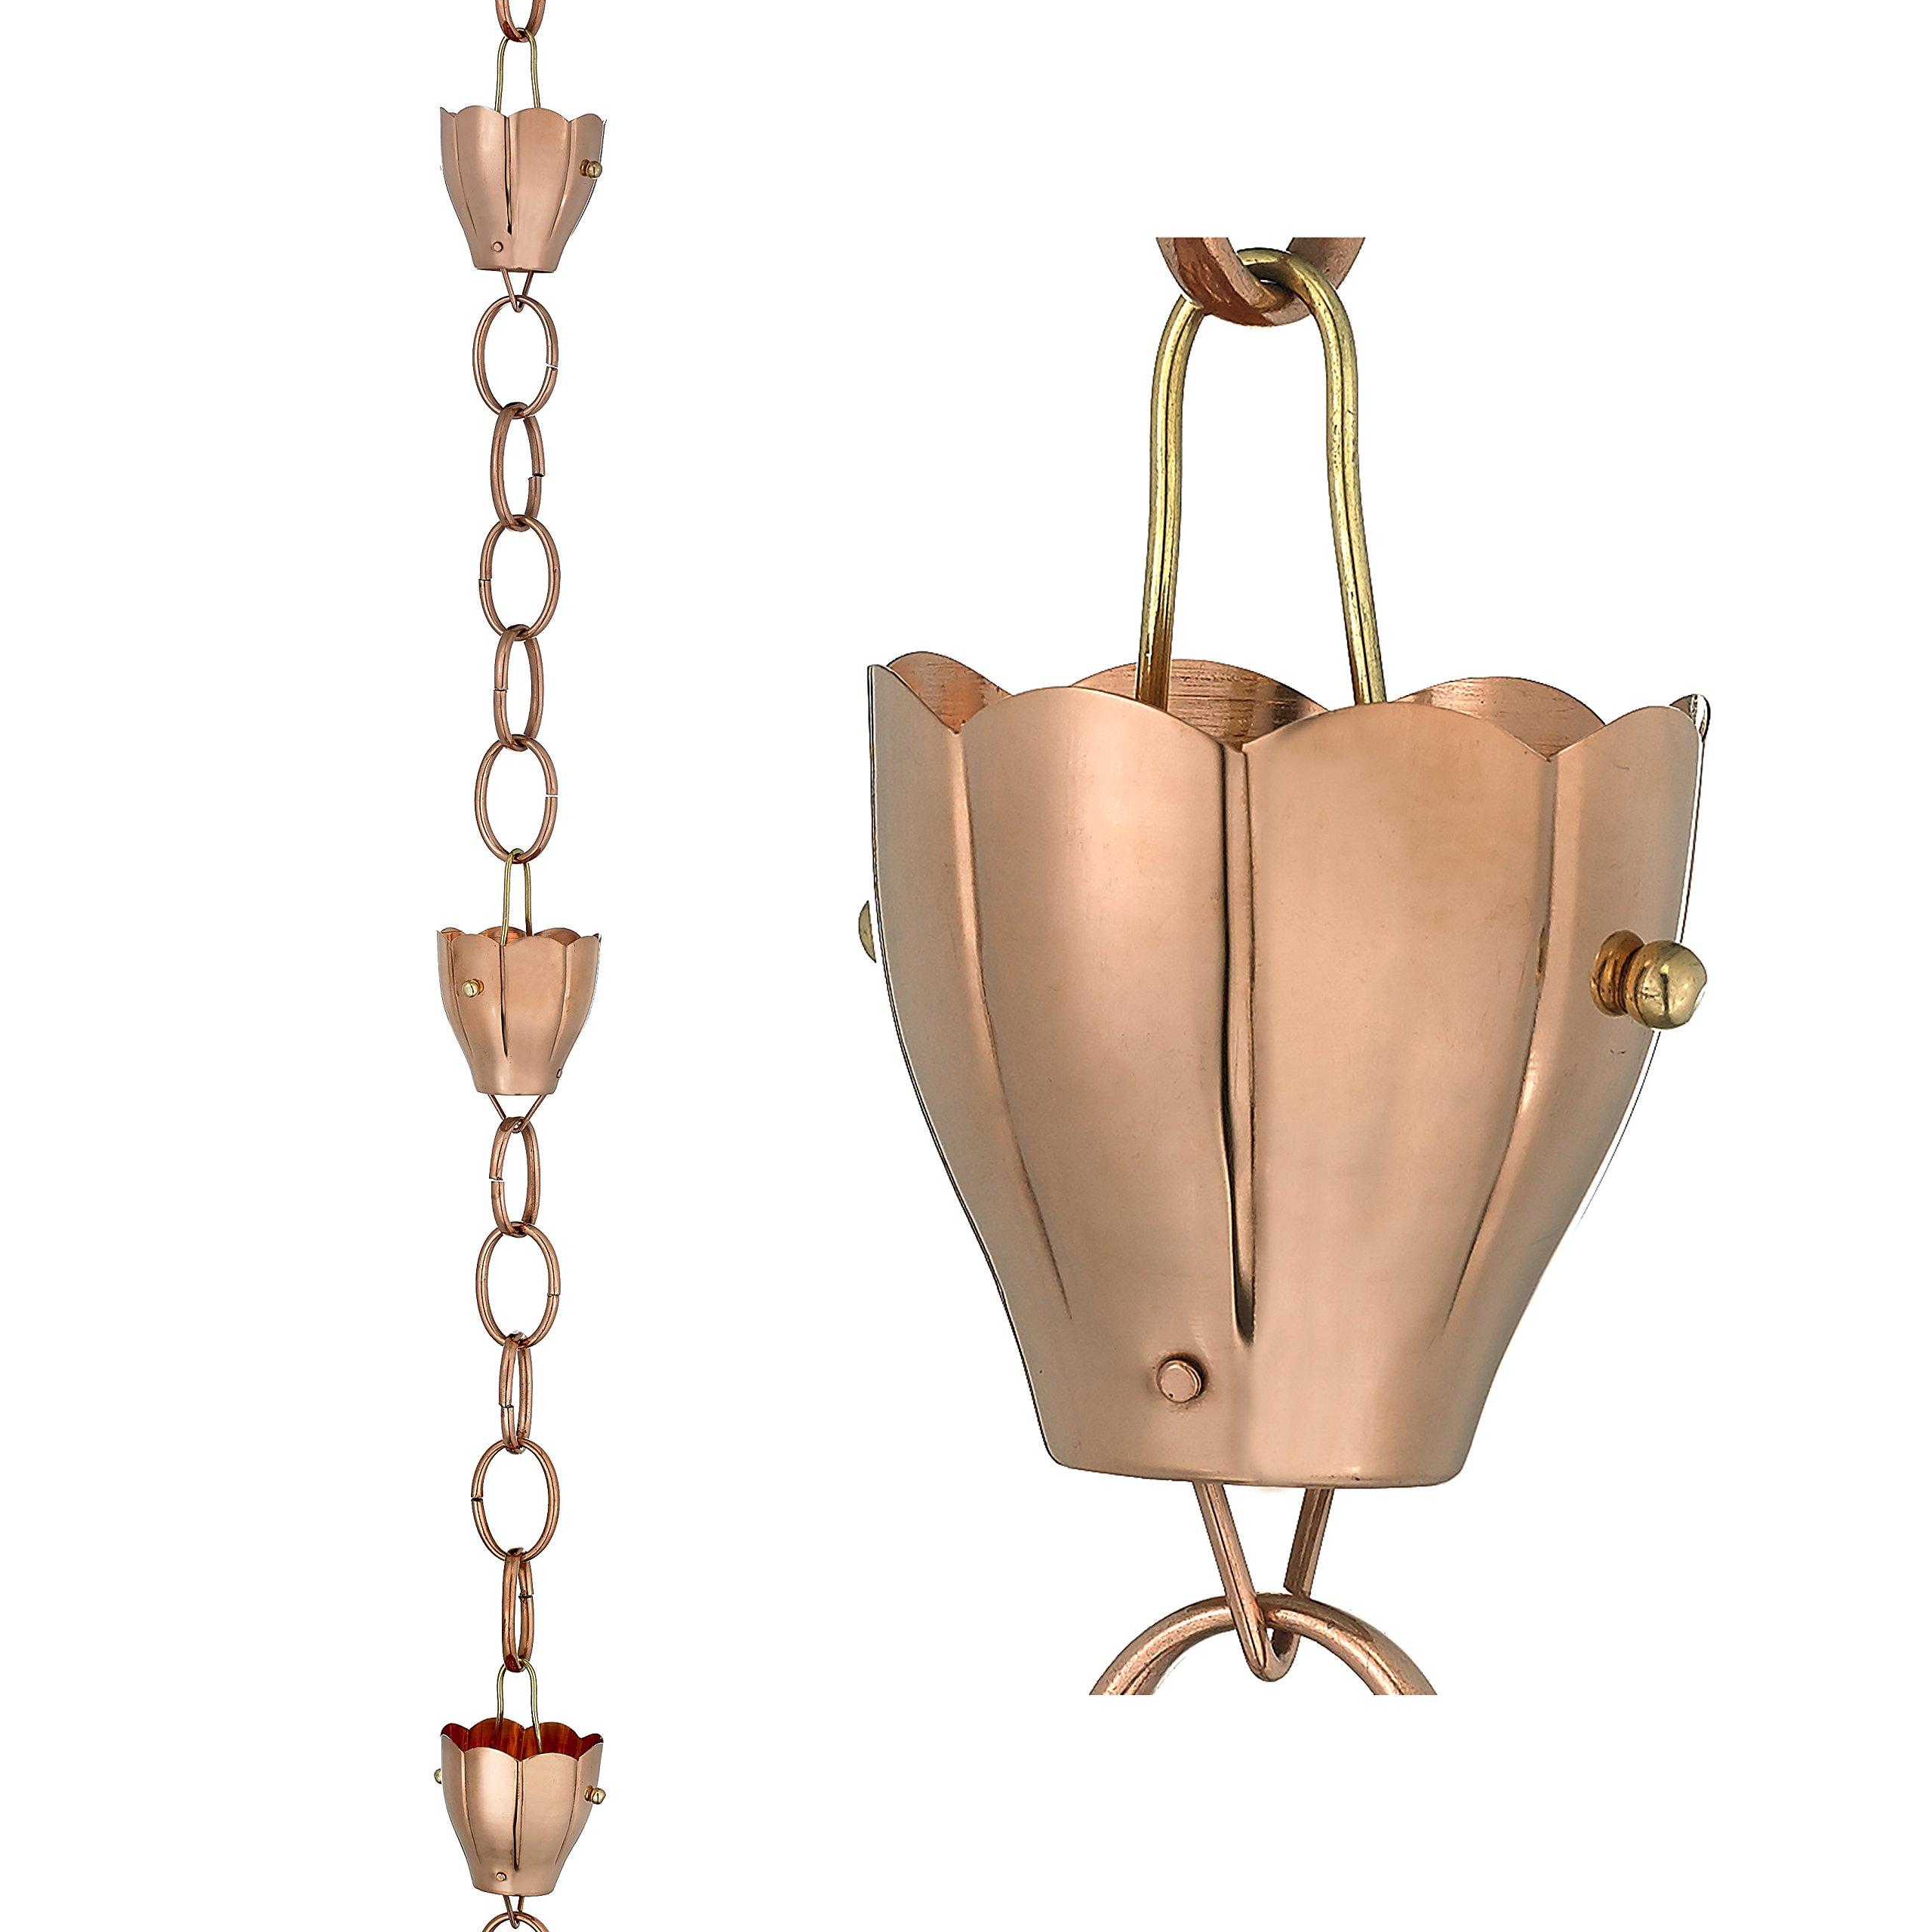 Good Directions 6 Cup Crocus Pure Copper 8.5-Foot Rain Chain